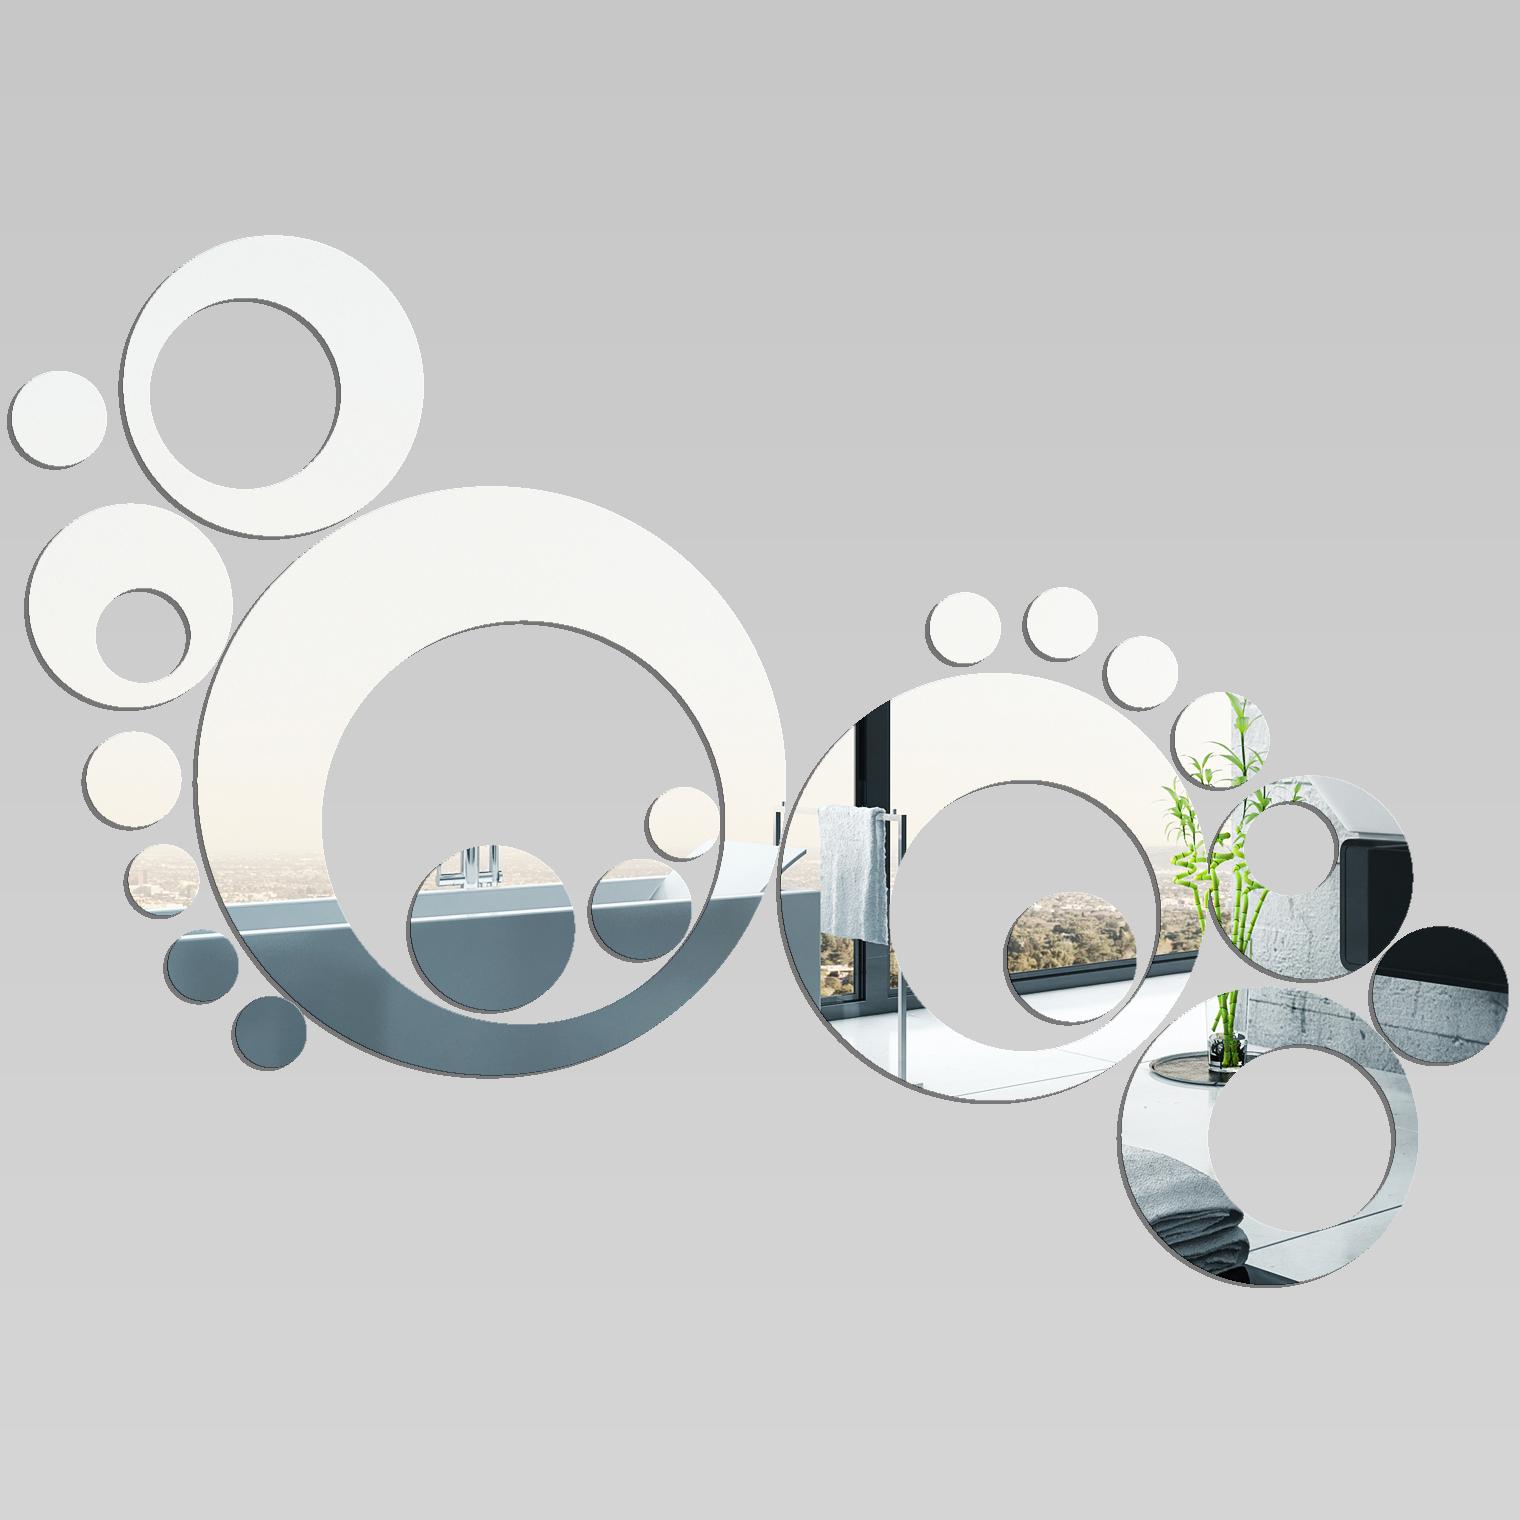 Miroir plexiglass acrylique design 7 pas cher for Miroir acrylique